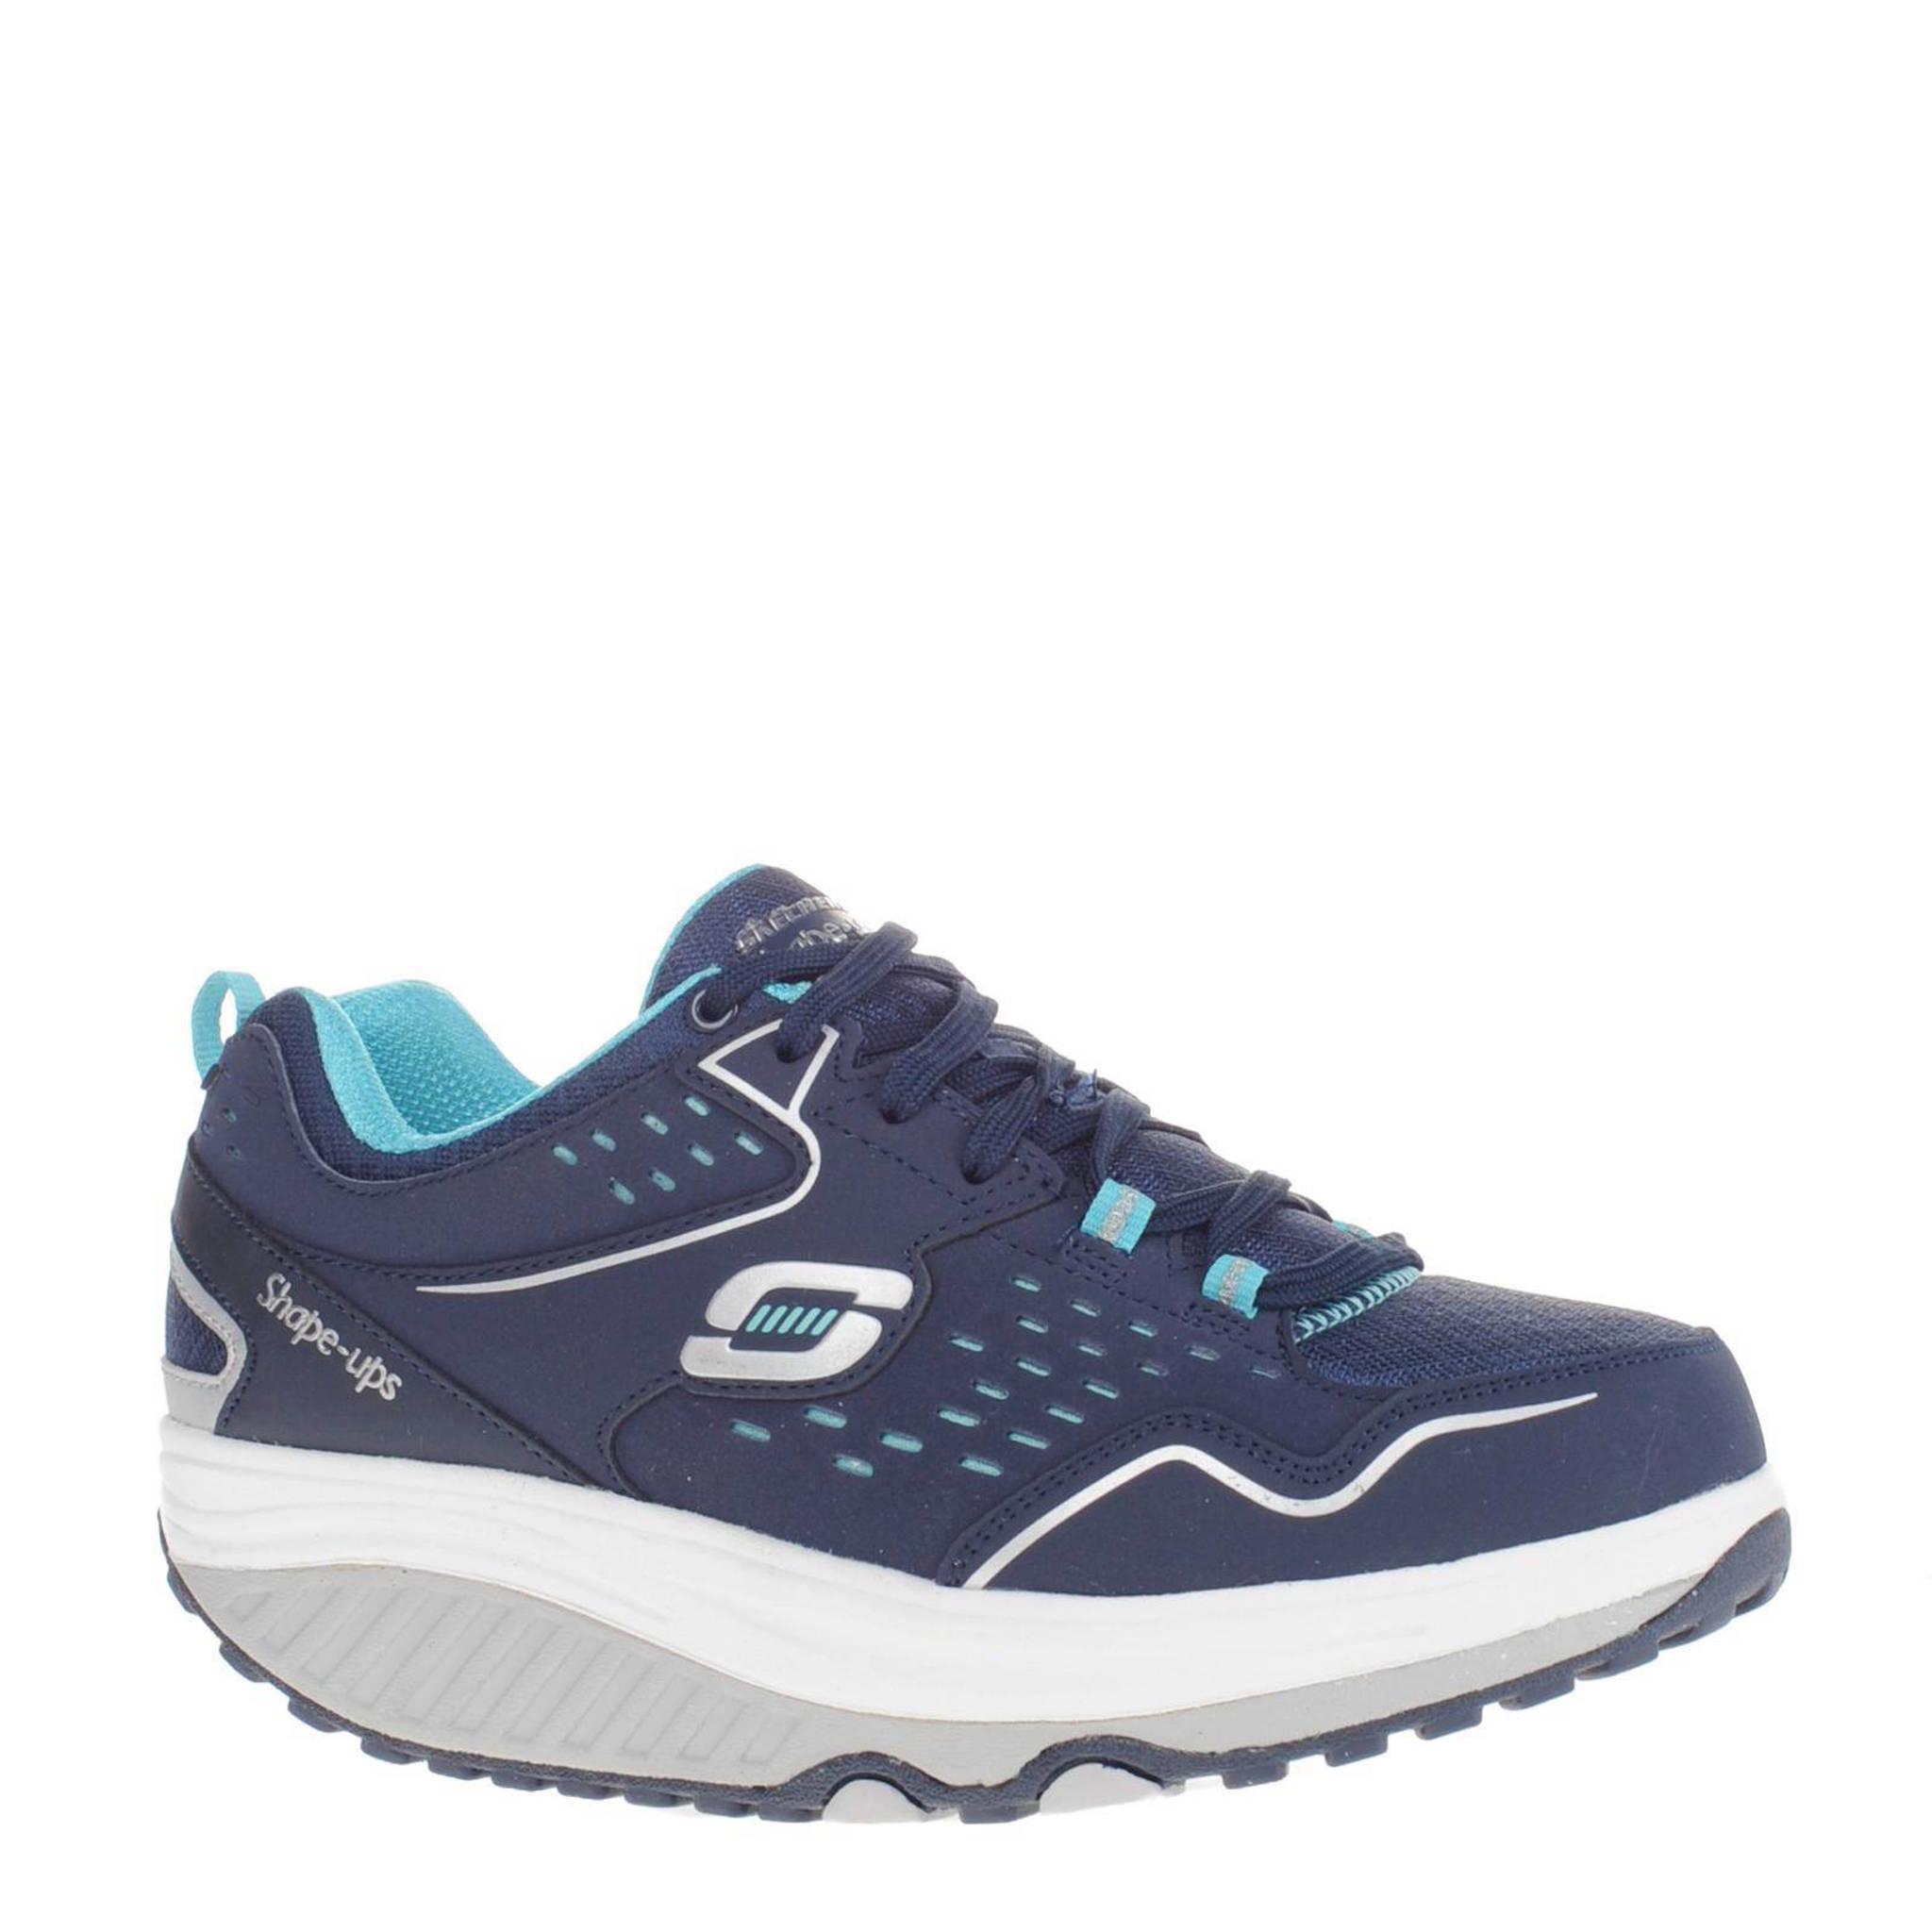 6d6c6848caffcb Skechers Shape-ups sneakers   wehkamp